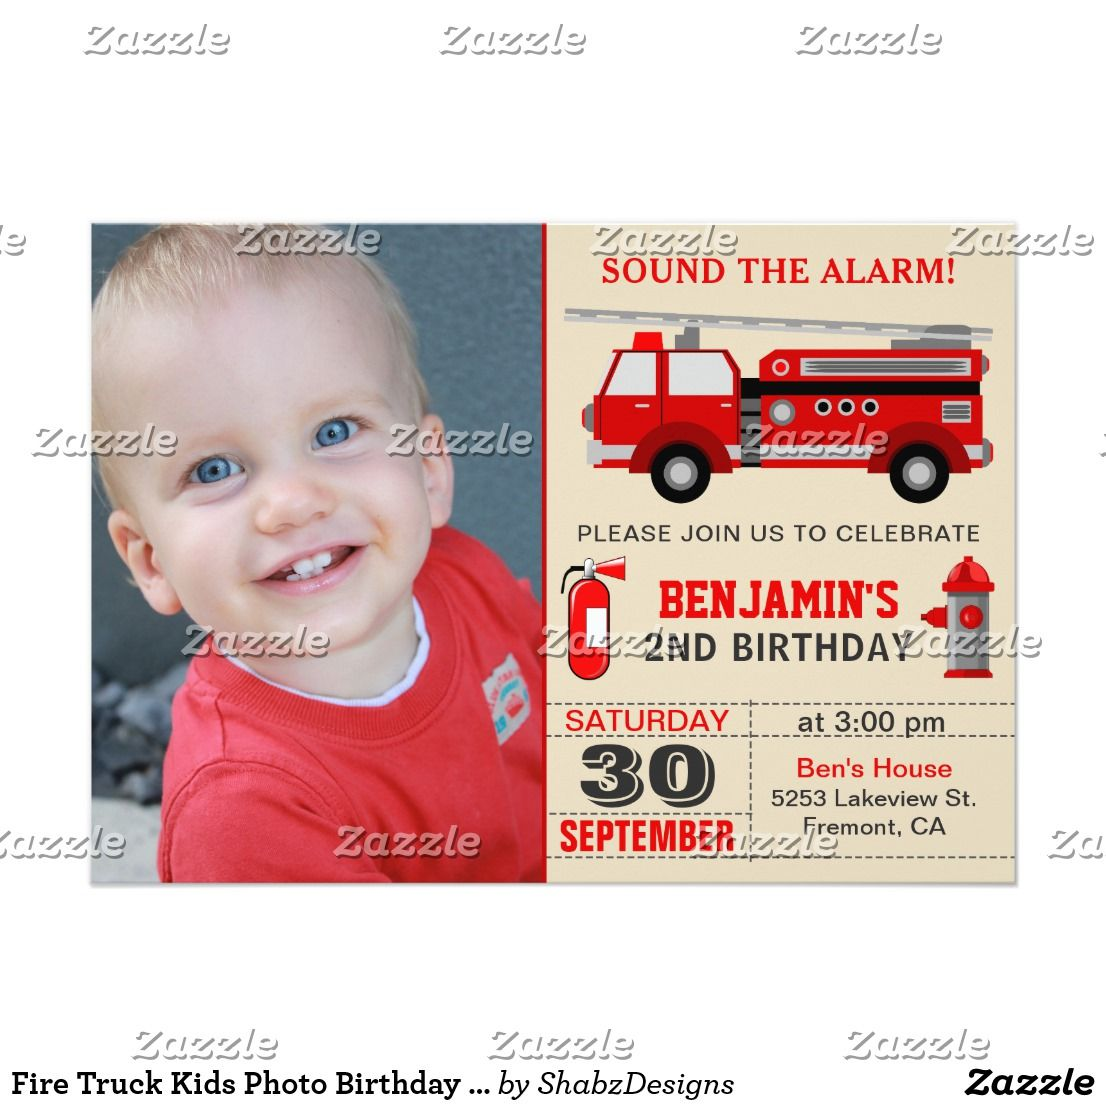 Fire Truck Kids Photo Birthday Party Invitation   Kids 2-12 Birthday ...